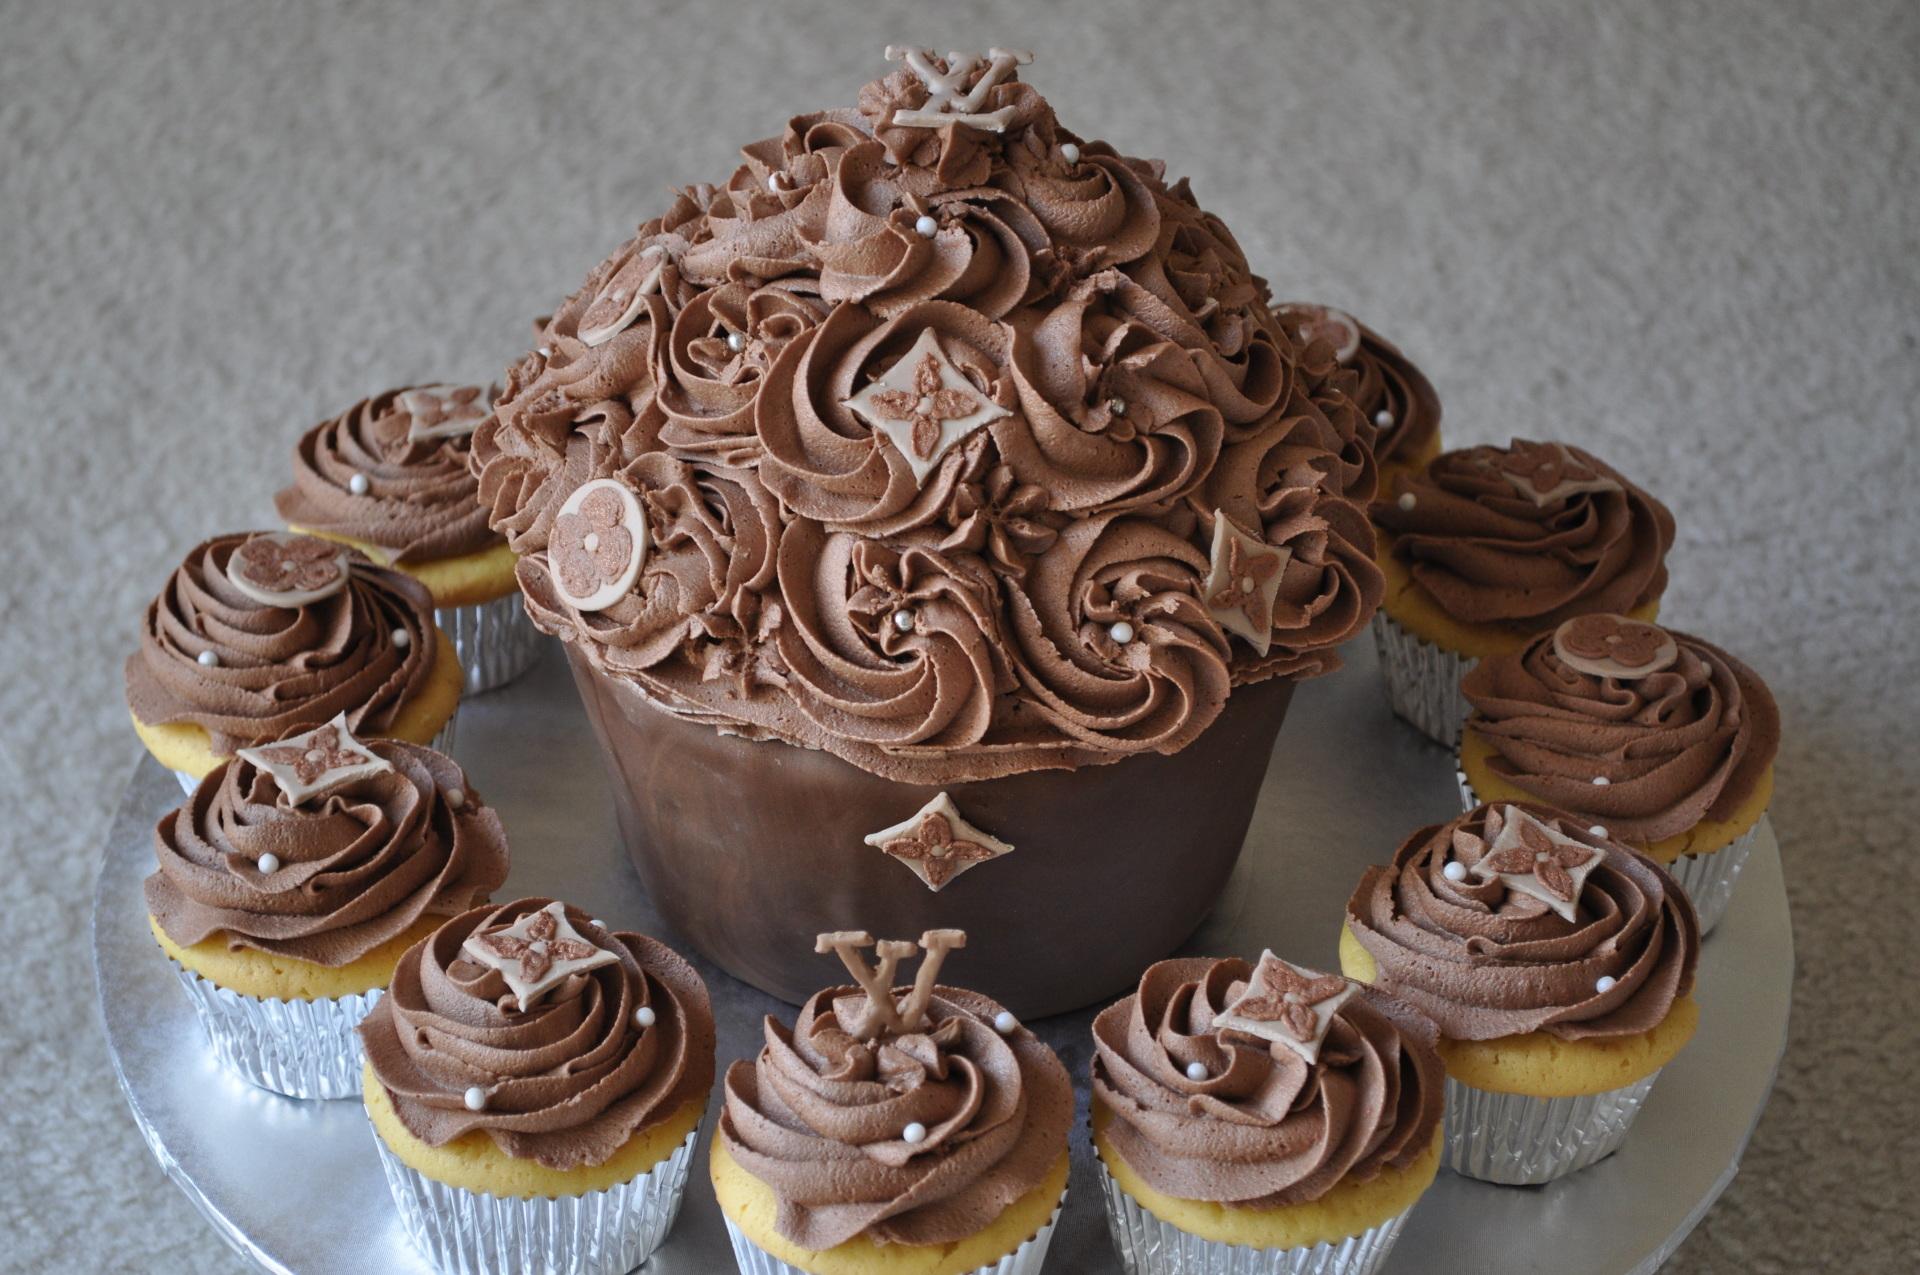 LV jumbo cupcake and cupcakes